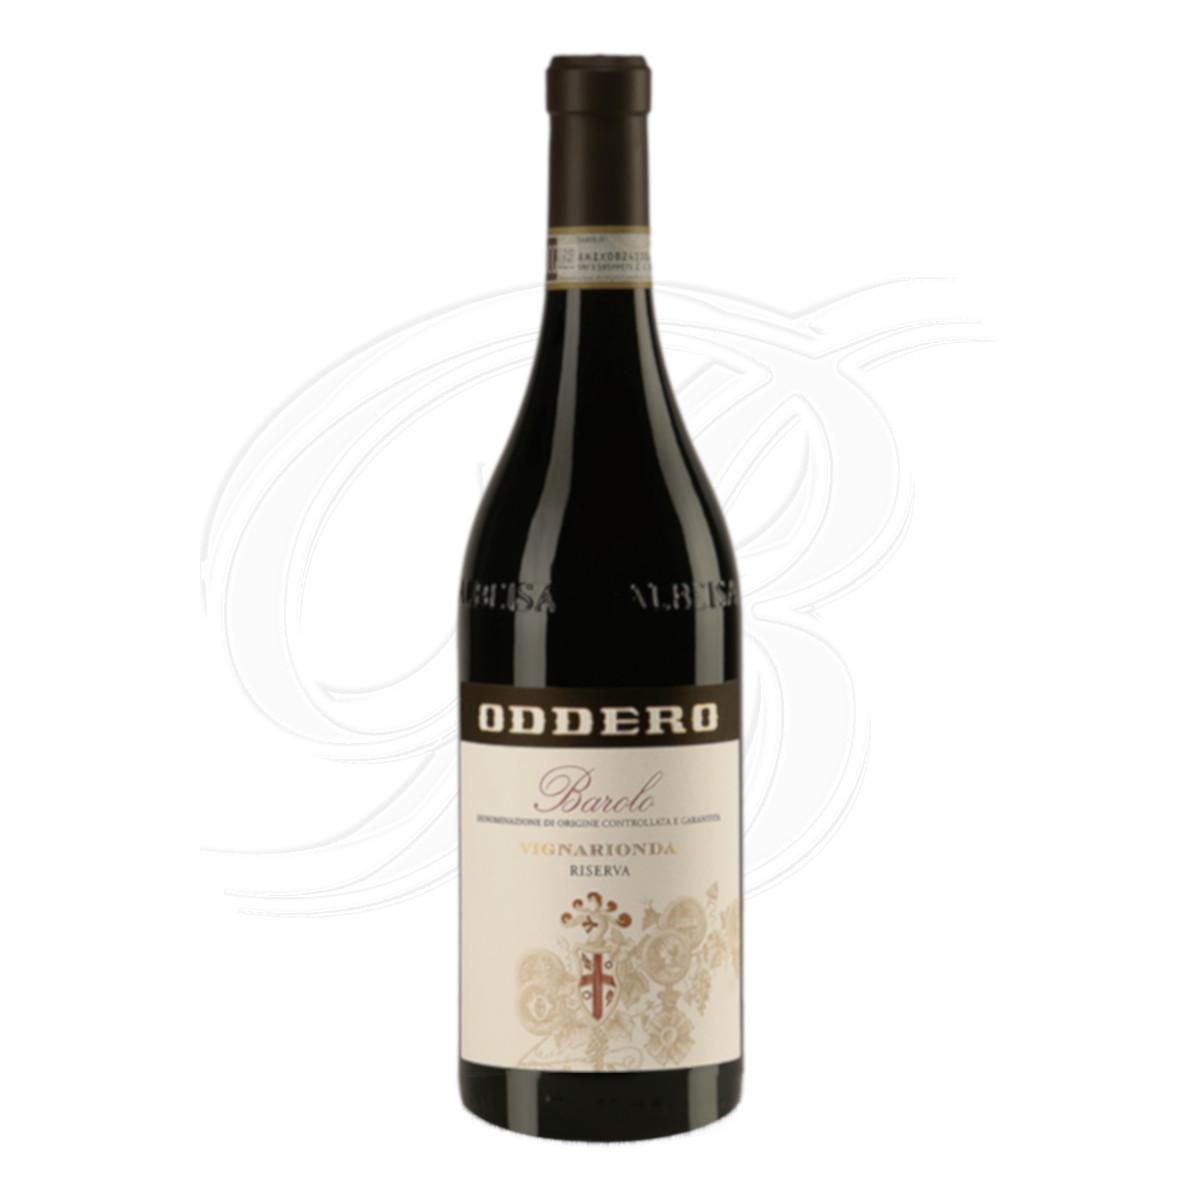 Barolo Riserva Vignarionda vom Weingut Oddero Poderi in La Morra im Piemont